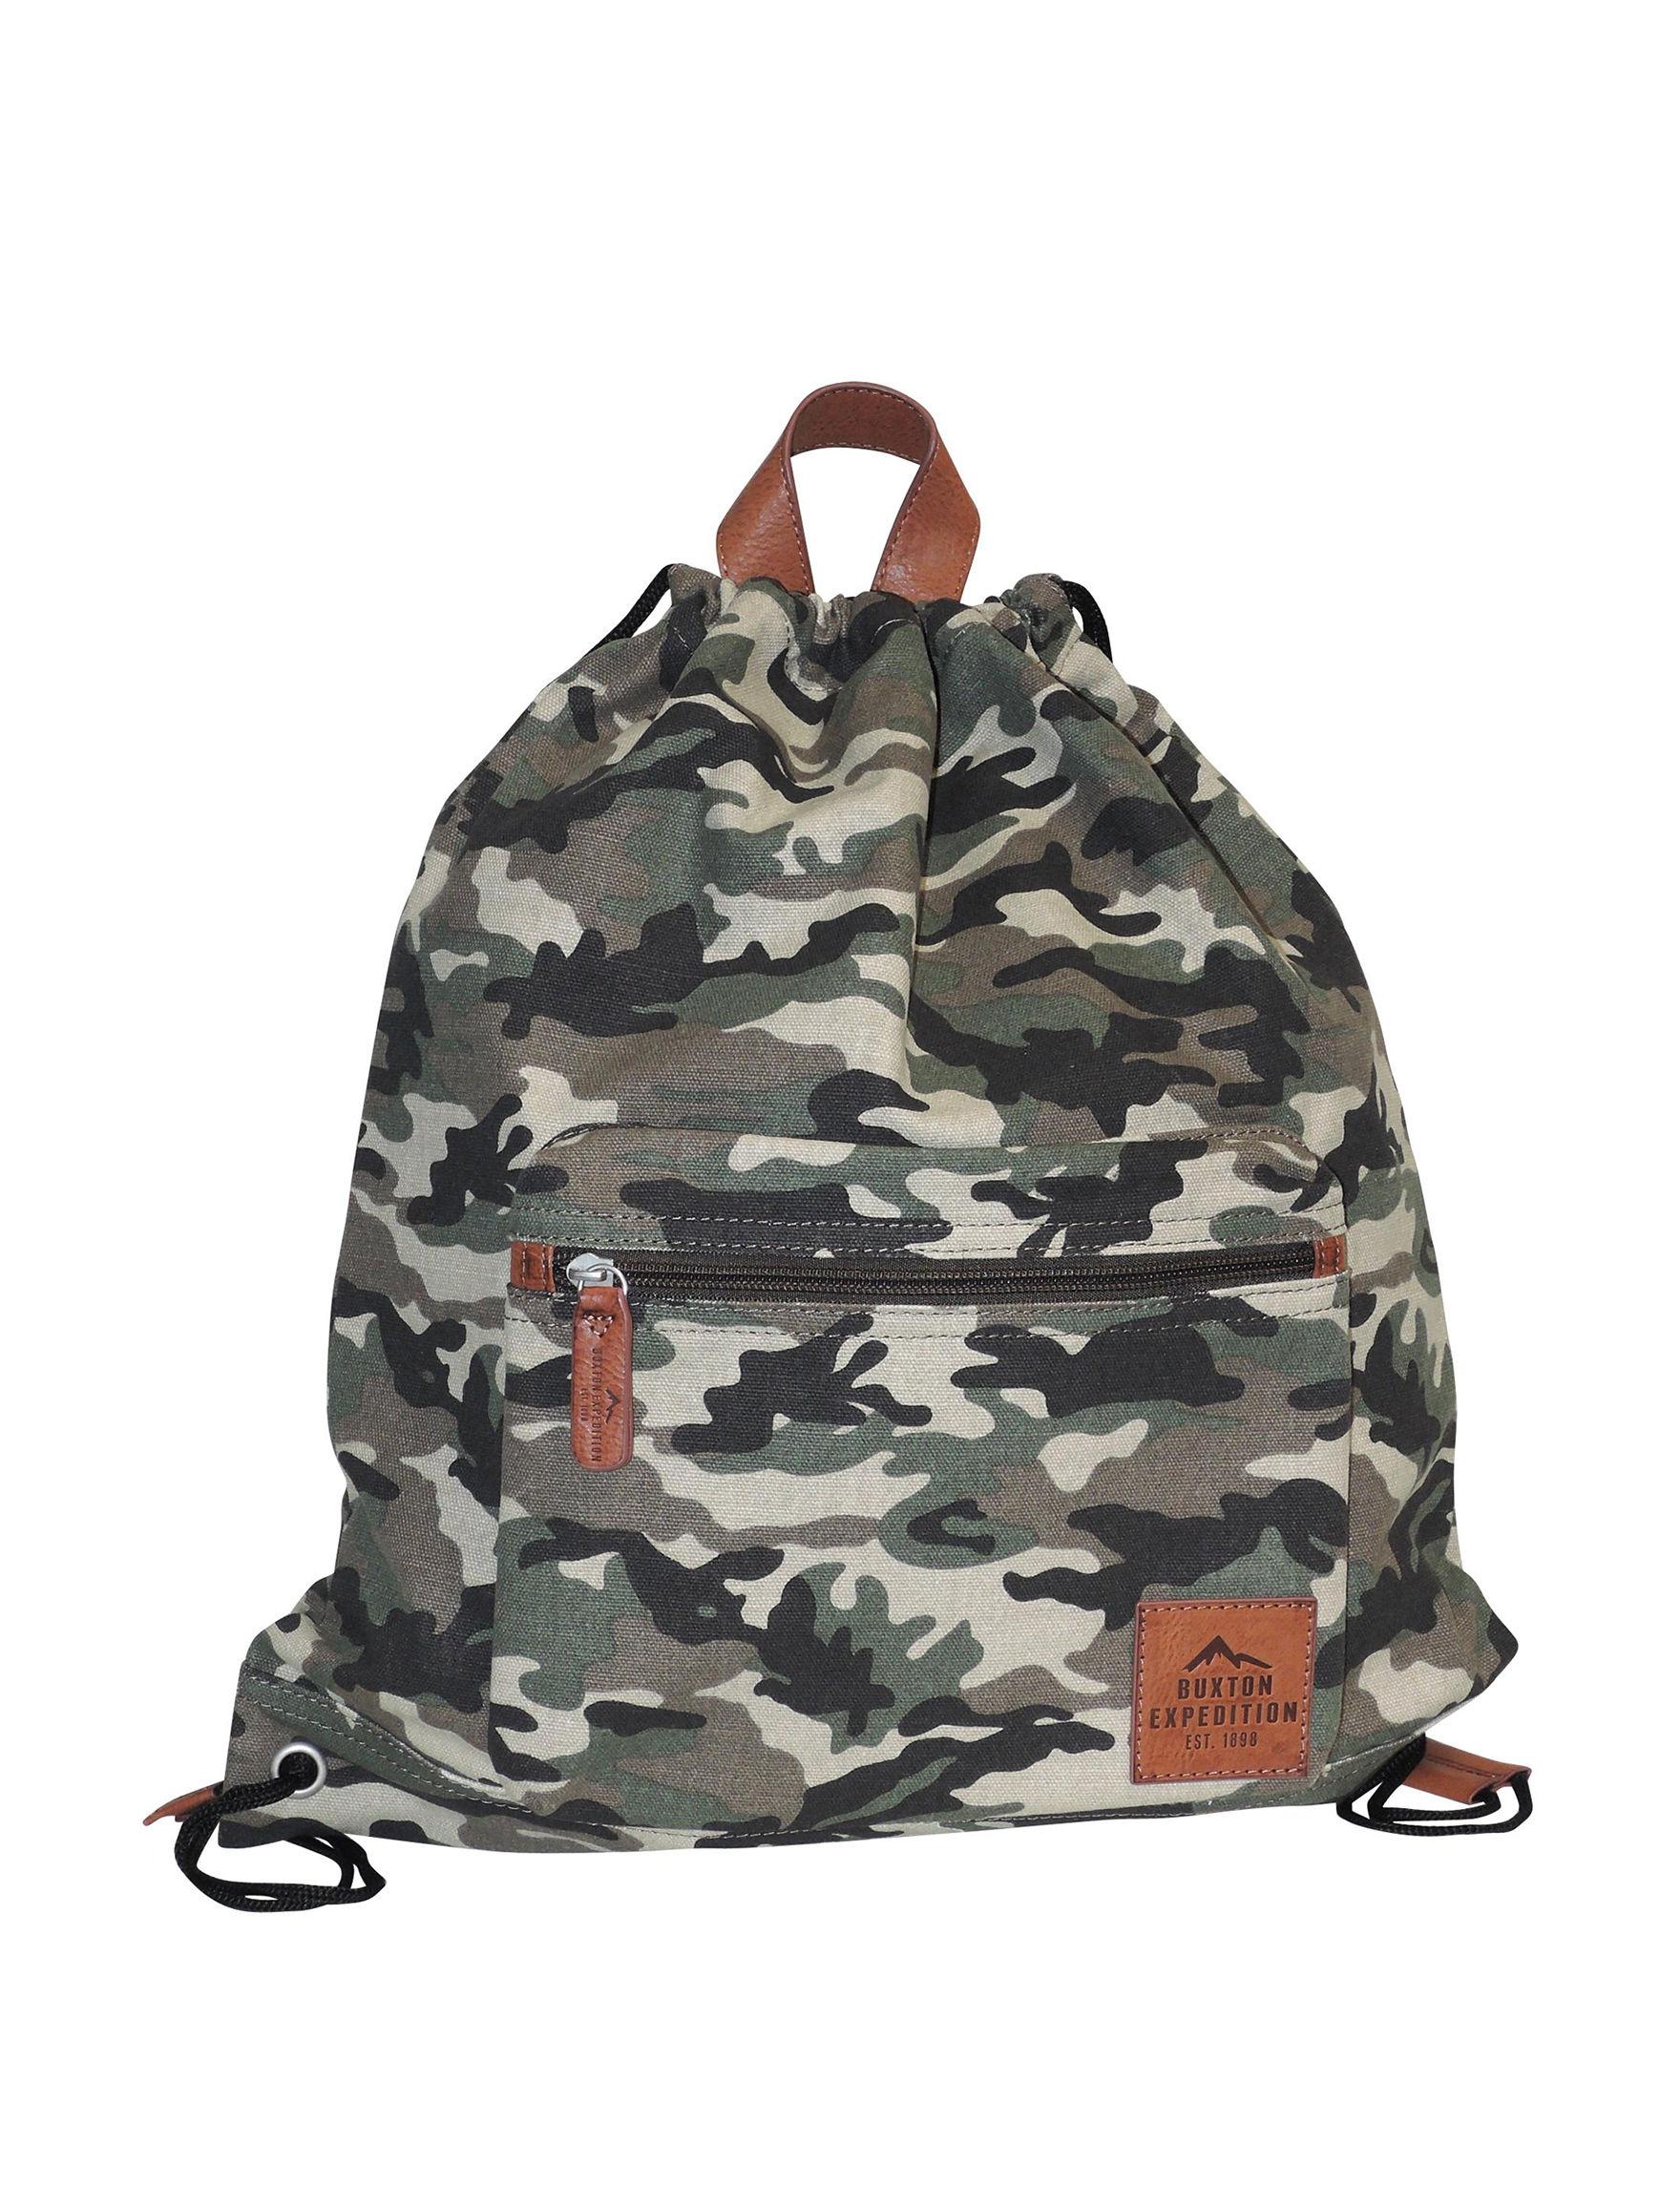 Buxton Camo Bookbags & Backpacks